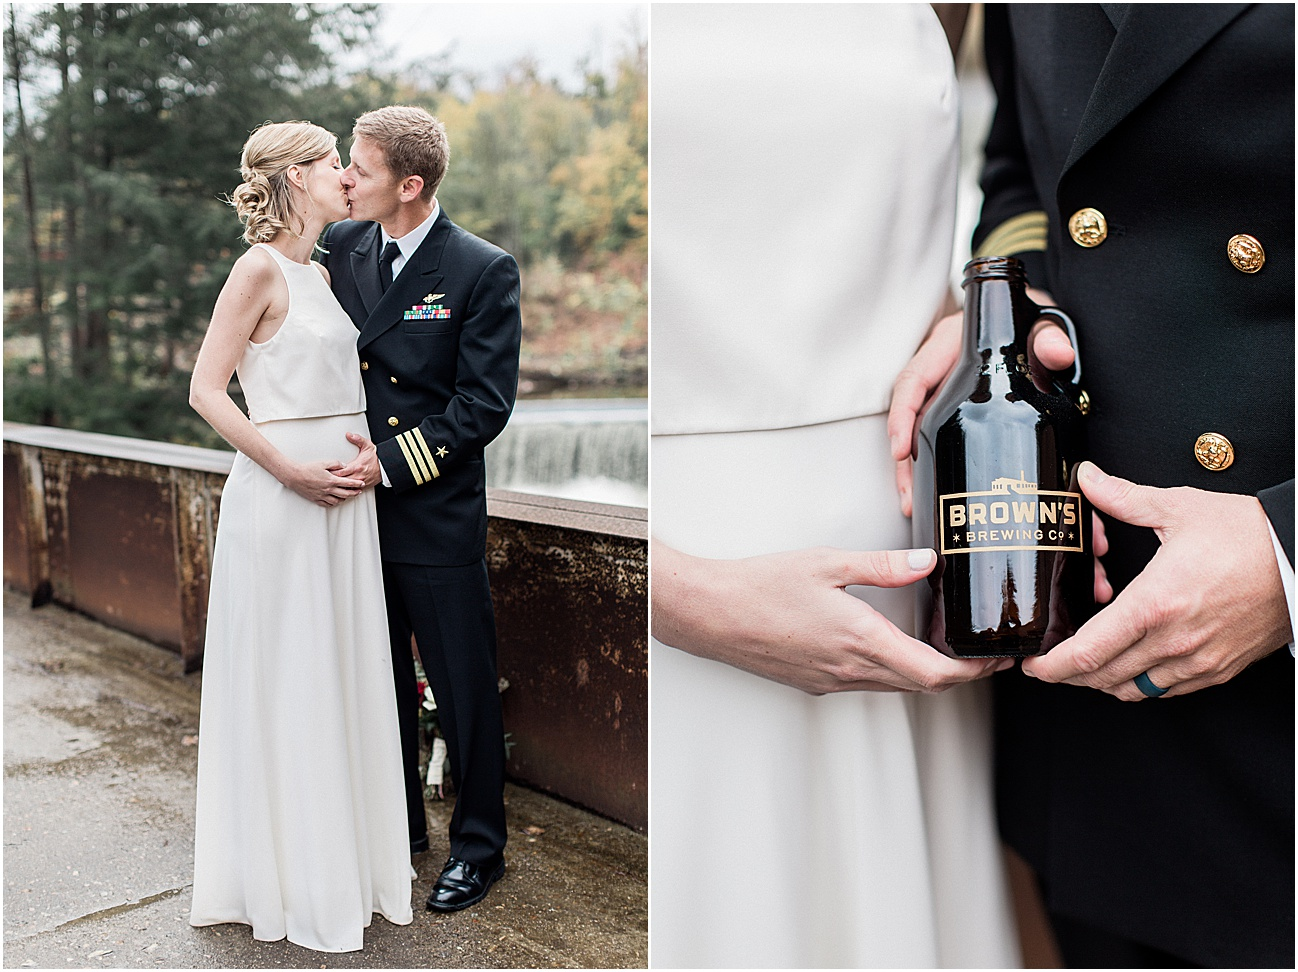 lauren_john_jon_ablany_browns_brewery_moses_farm_fall_cape_cod_boston_wedding_photographer_meredith_jane_photography_photo_1516.jpg